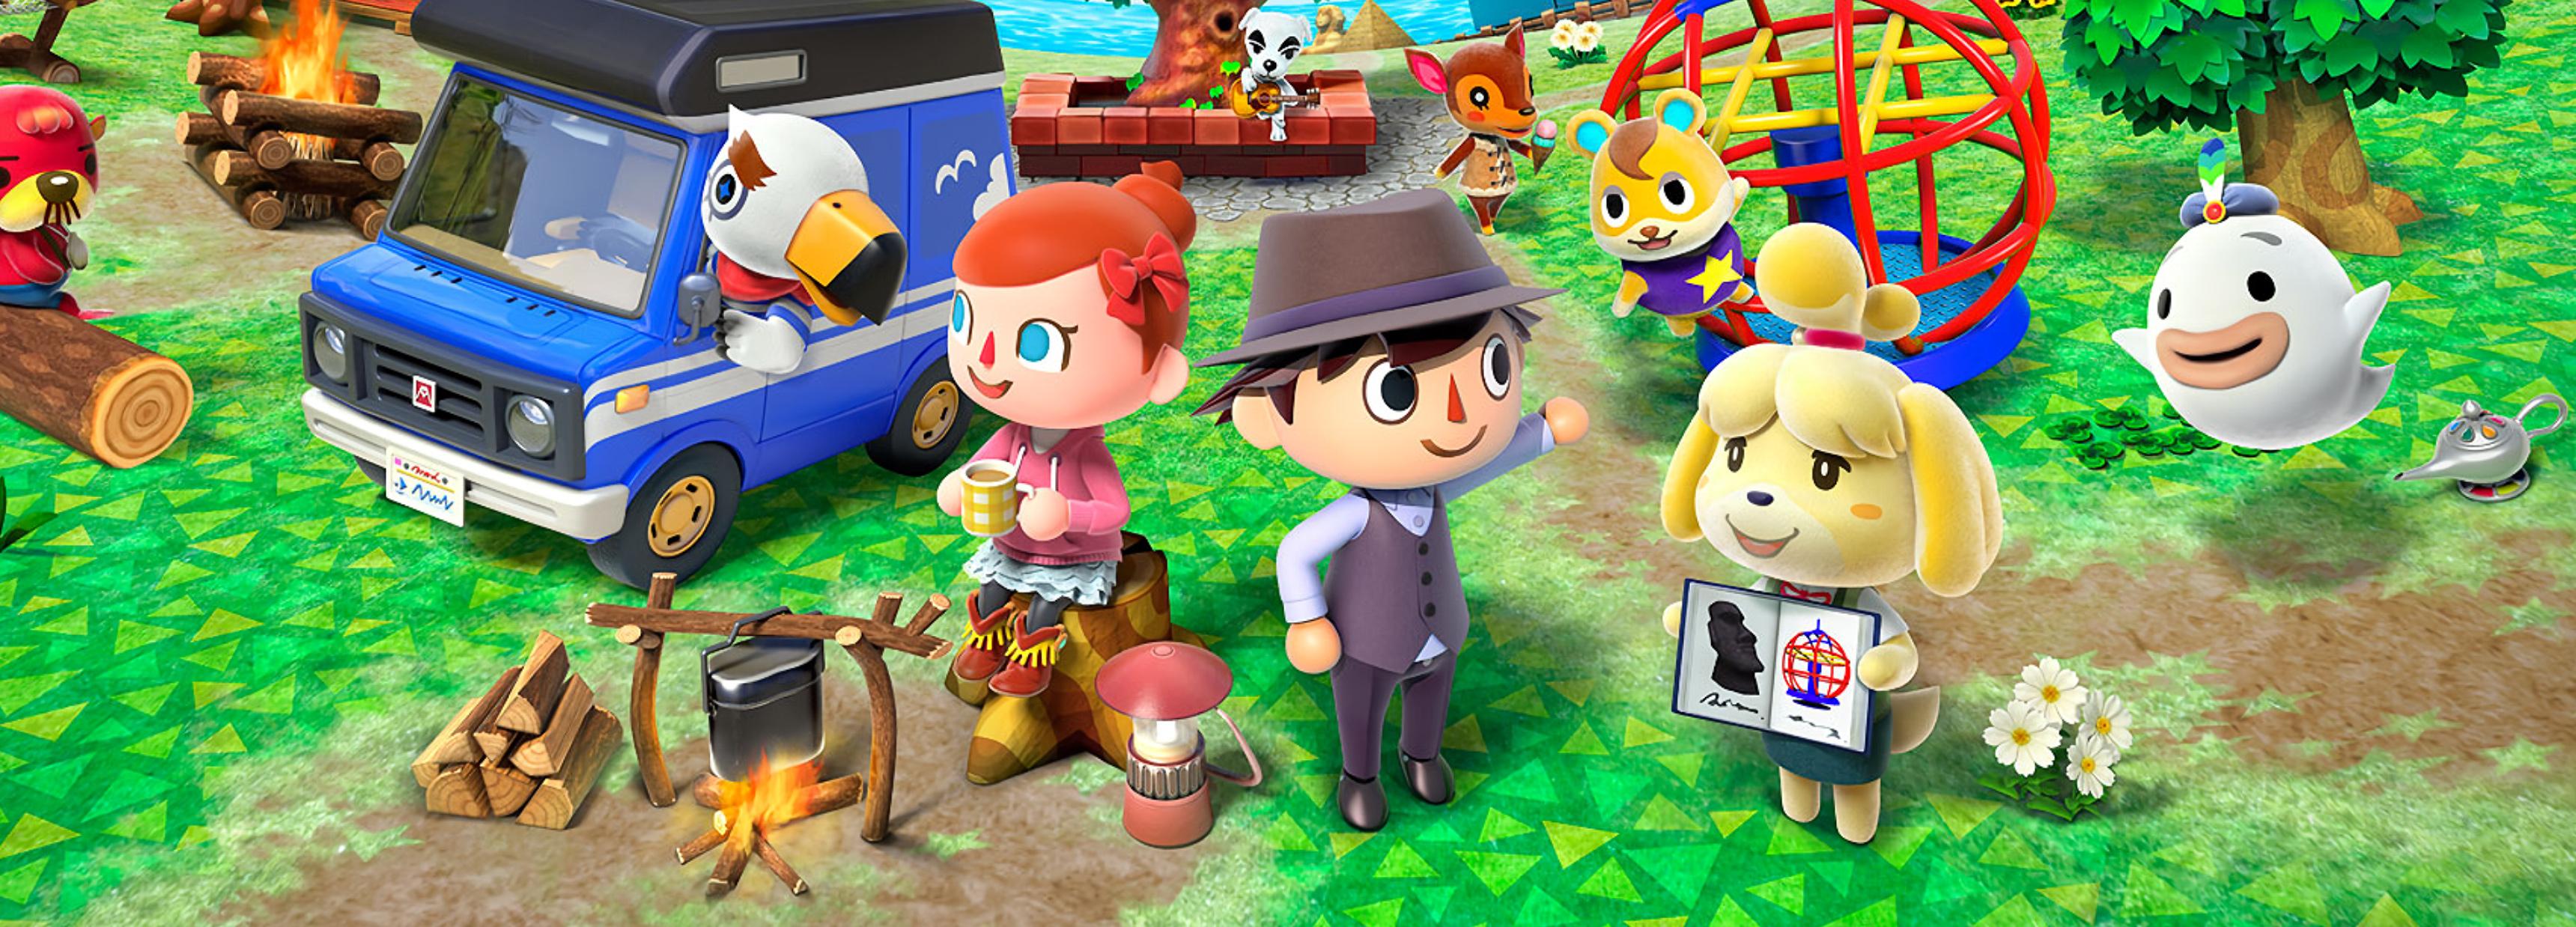 Animal Crossing New Leaf ALL furniture sets 25 Million Bells